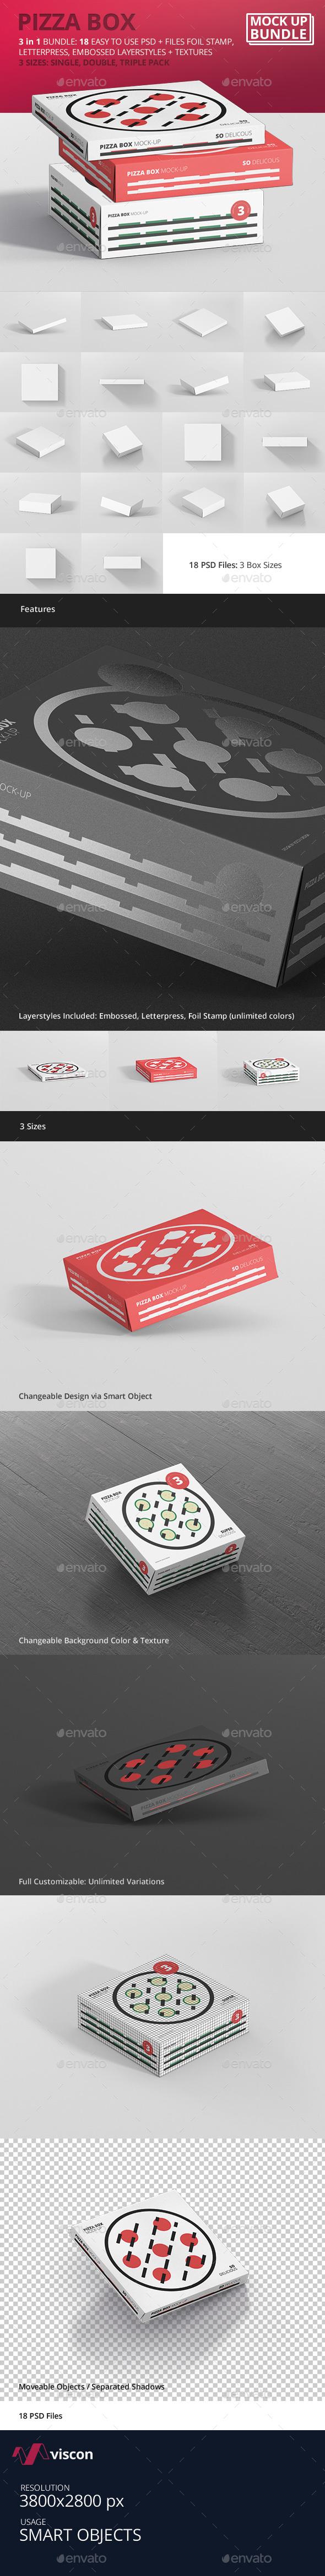 Pizza Box Mockup Bundle